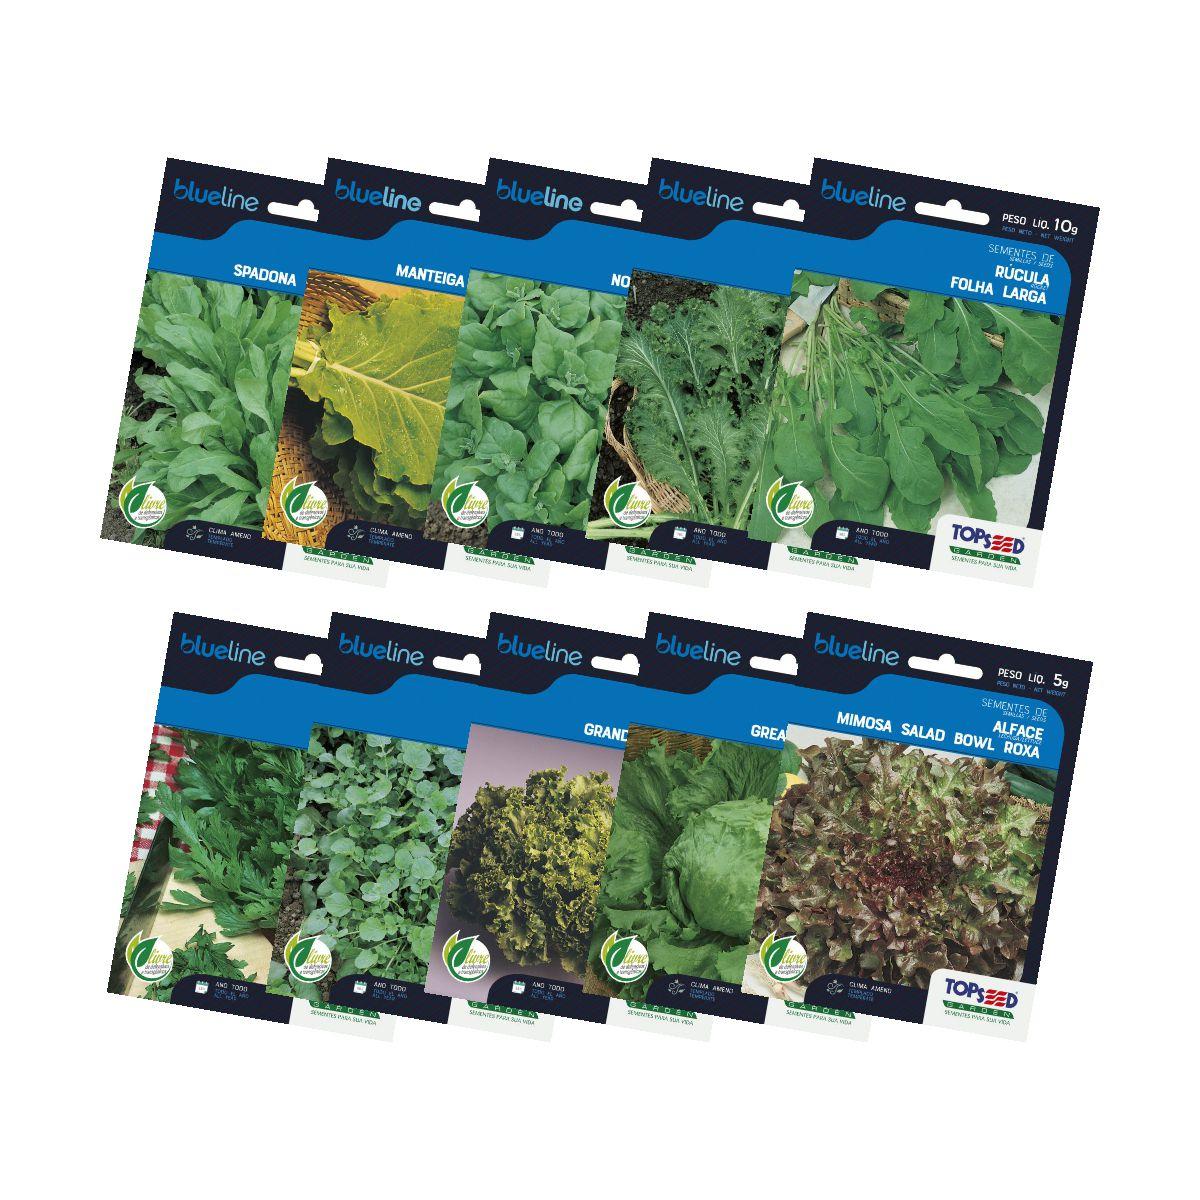 Kit Sementes de Folhosas 10 variedades Topseed Garden